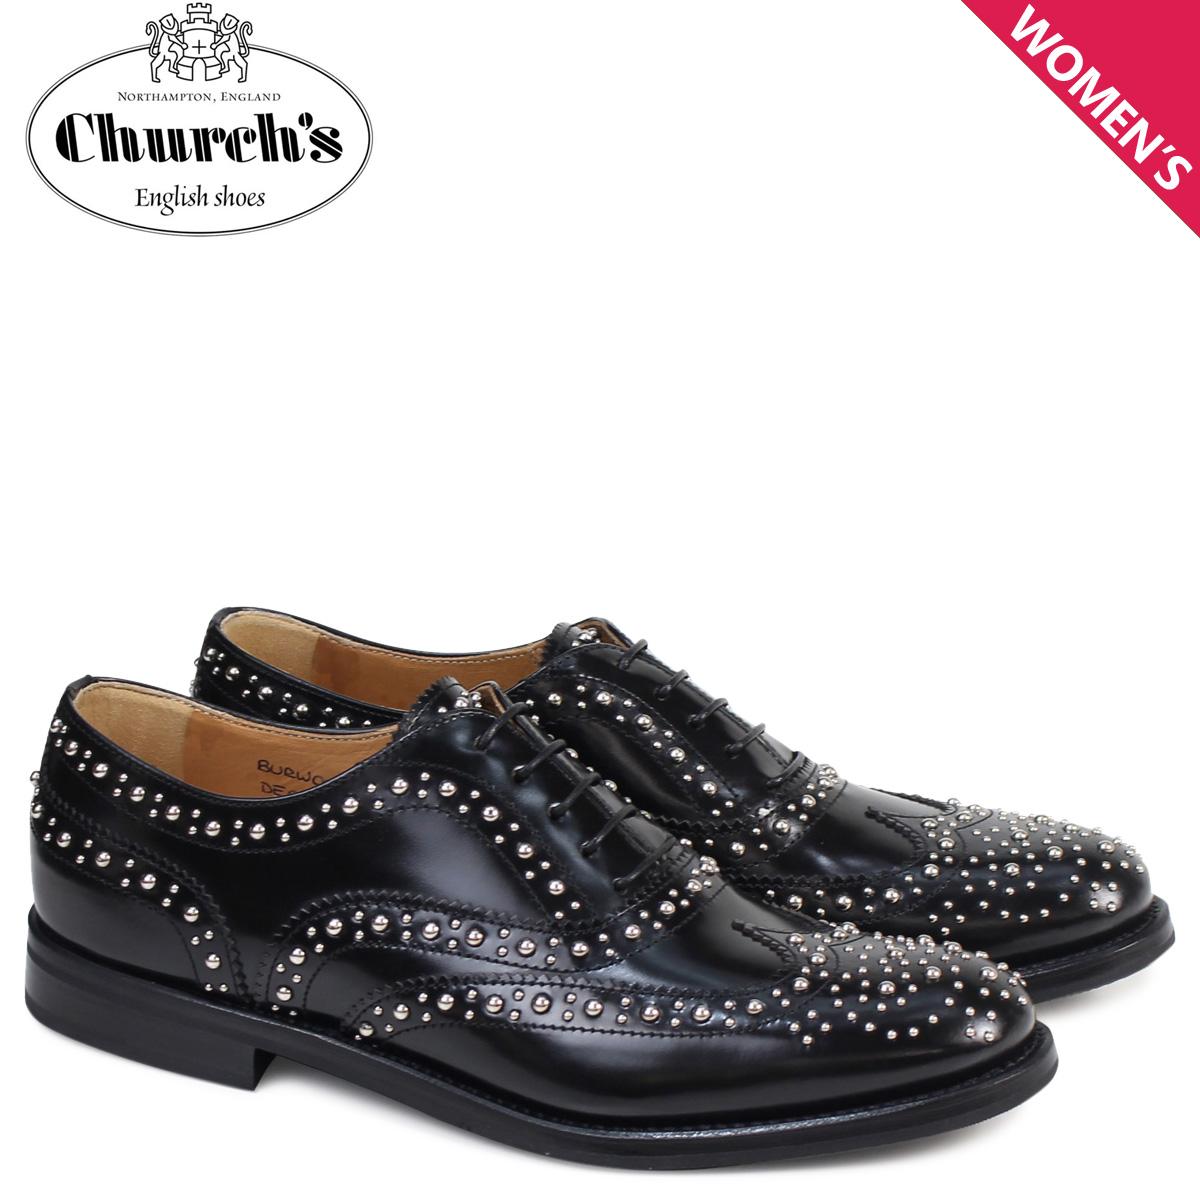 Church's 靴 レディース チャーチ バーウッド シューズ ウイングチップ メット Burwood Met Polish Binder Calf 8746 DE0002 スタッズ ブラック